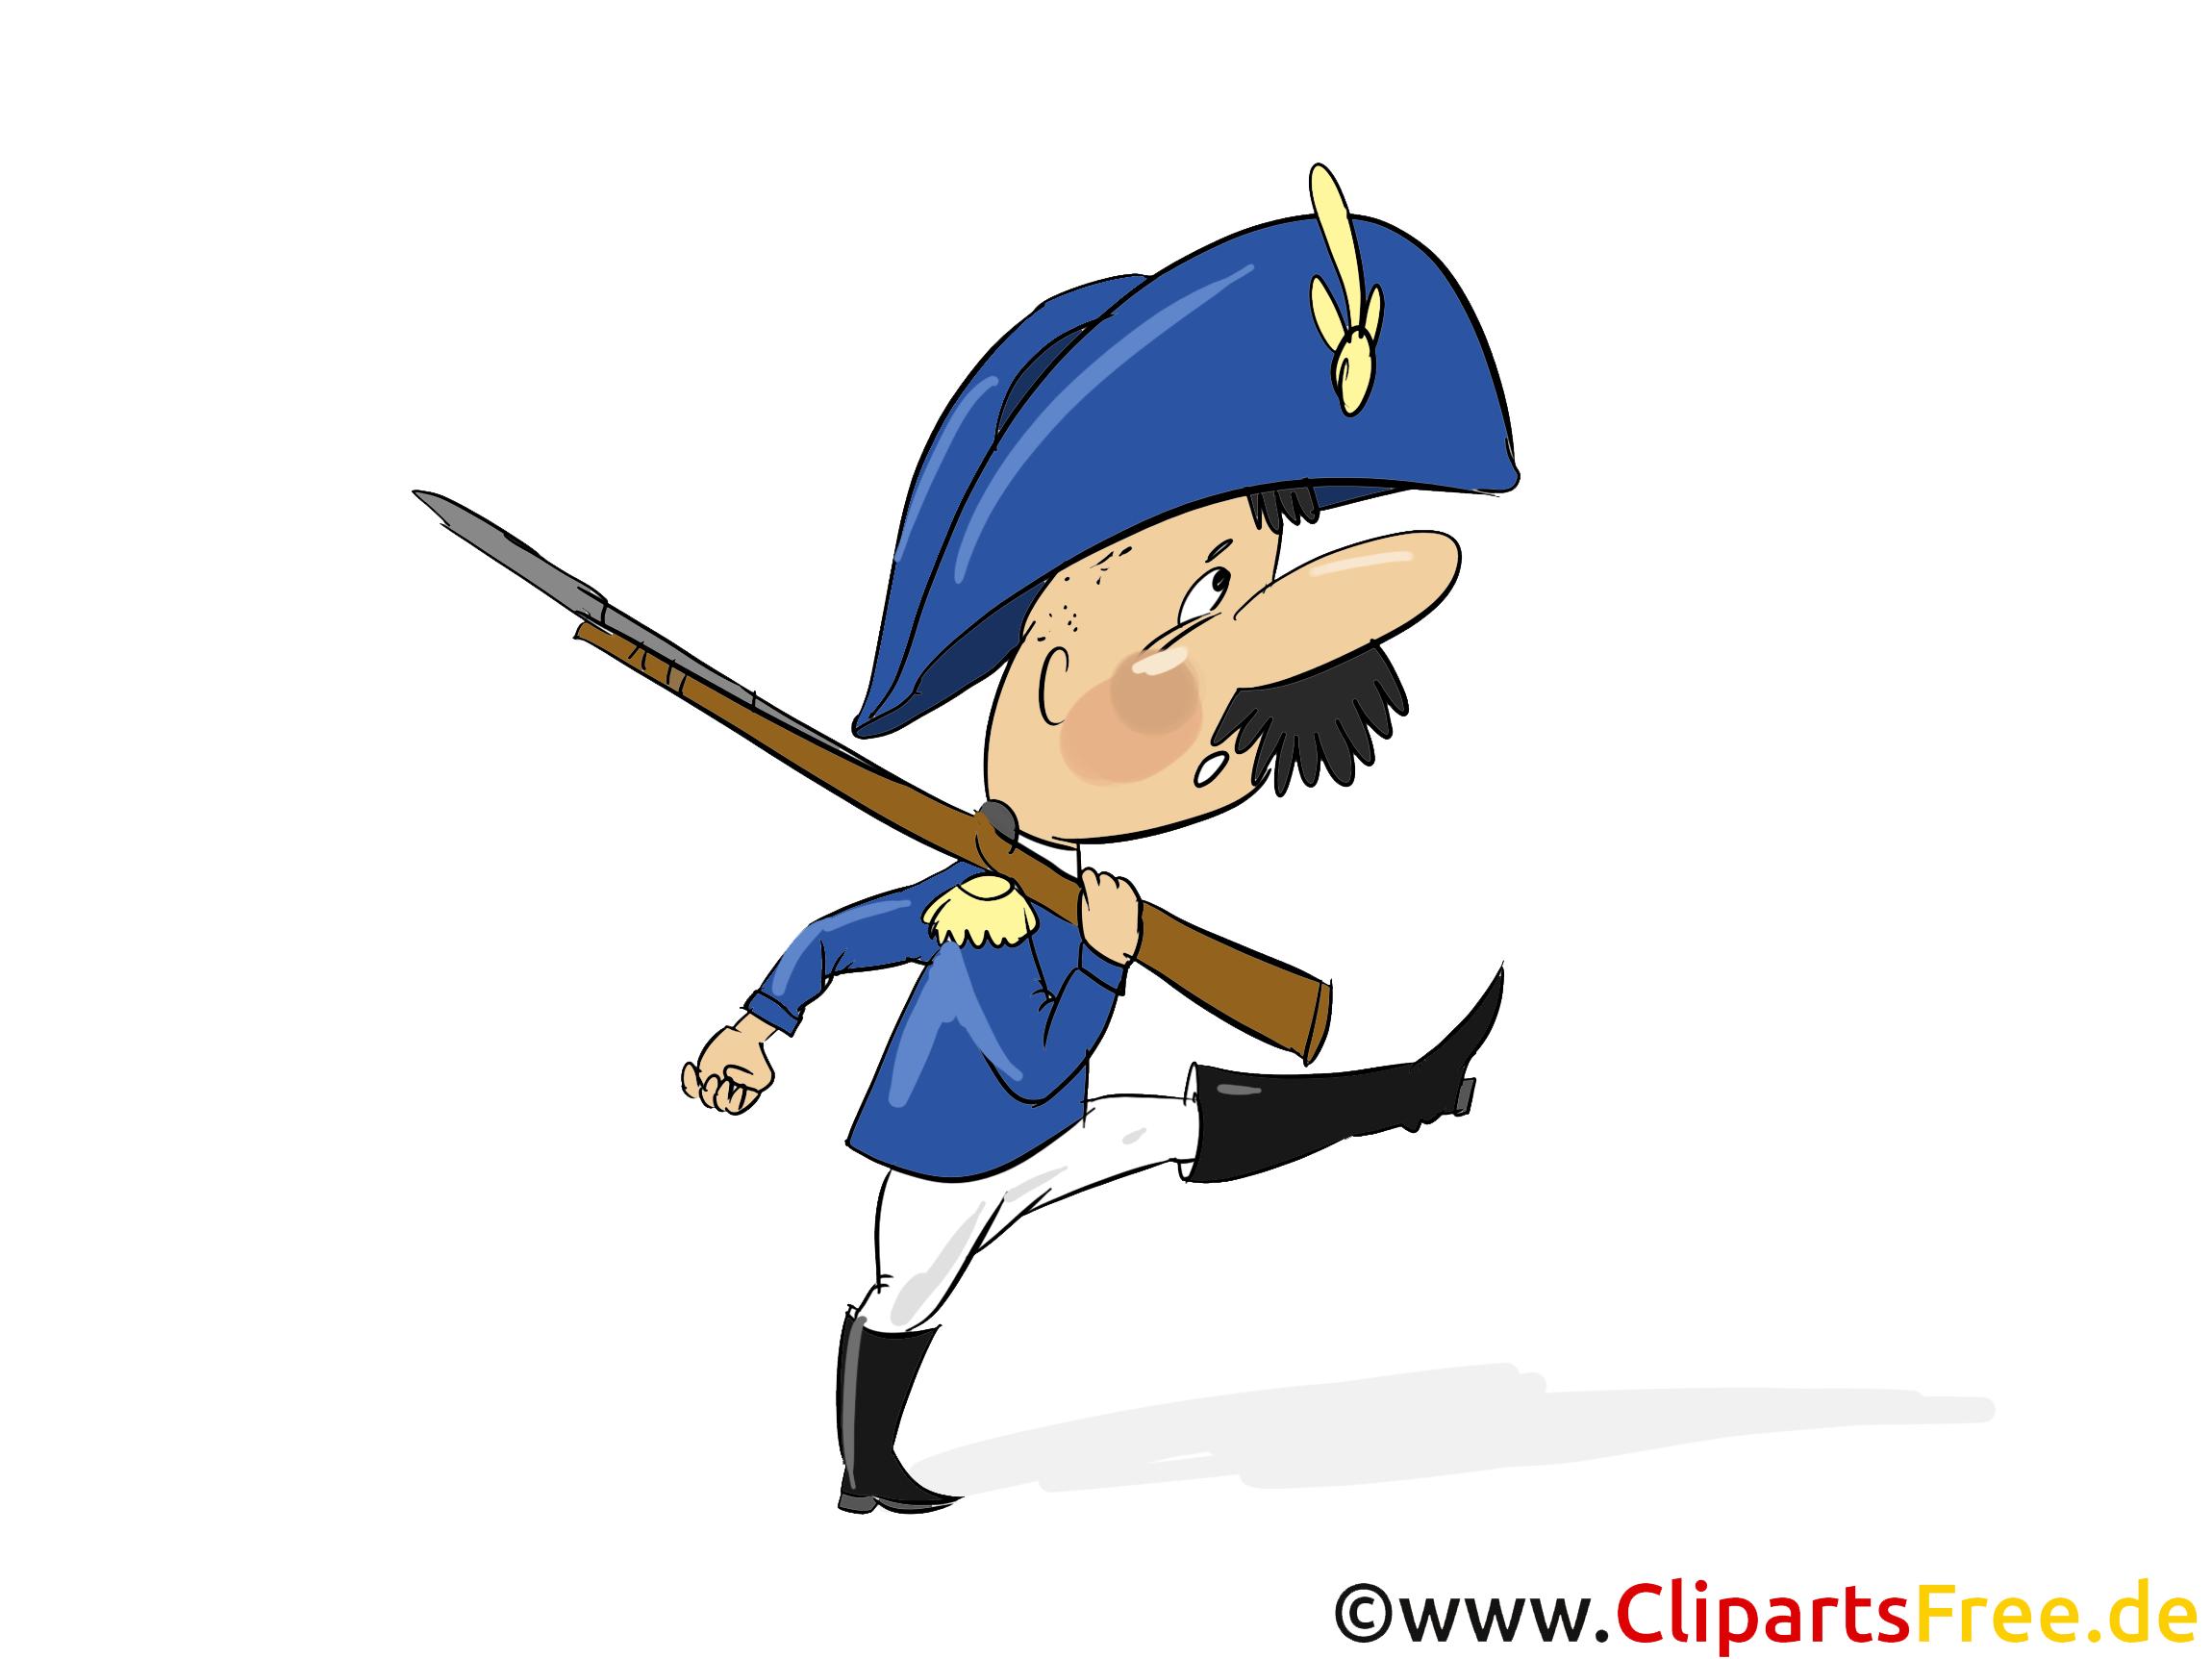 Soldat marschiert in alter Uniform Clipart, Bild, Illustration